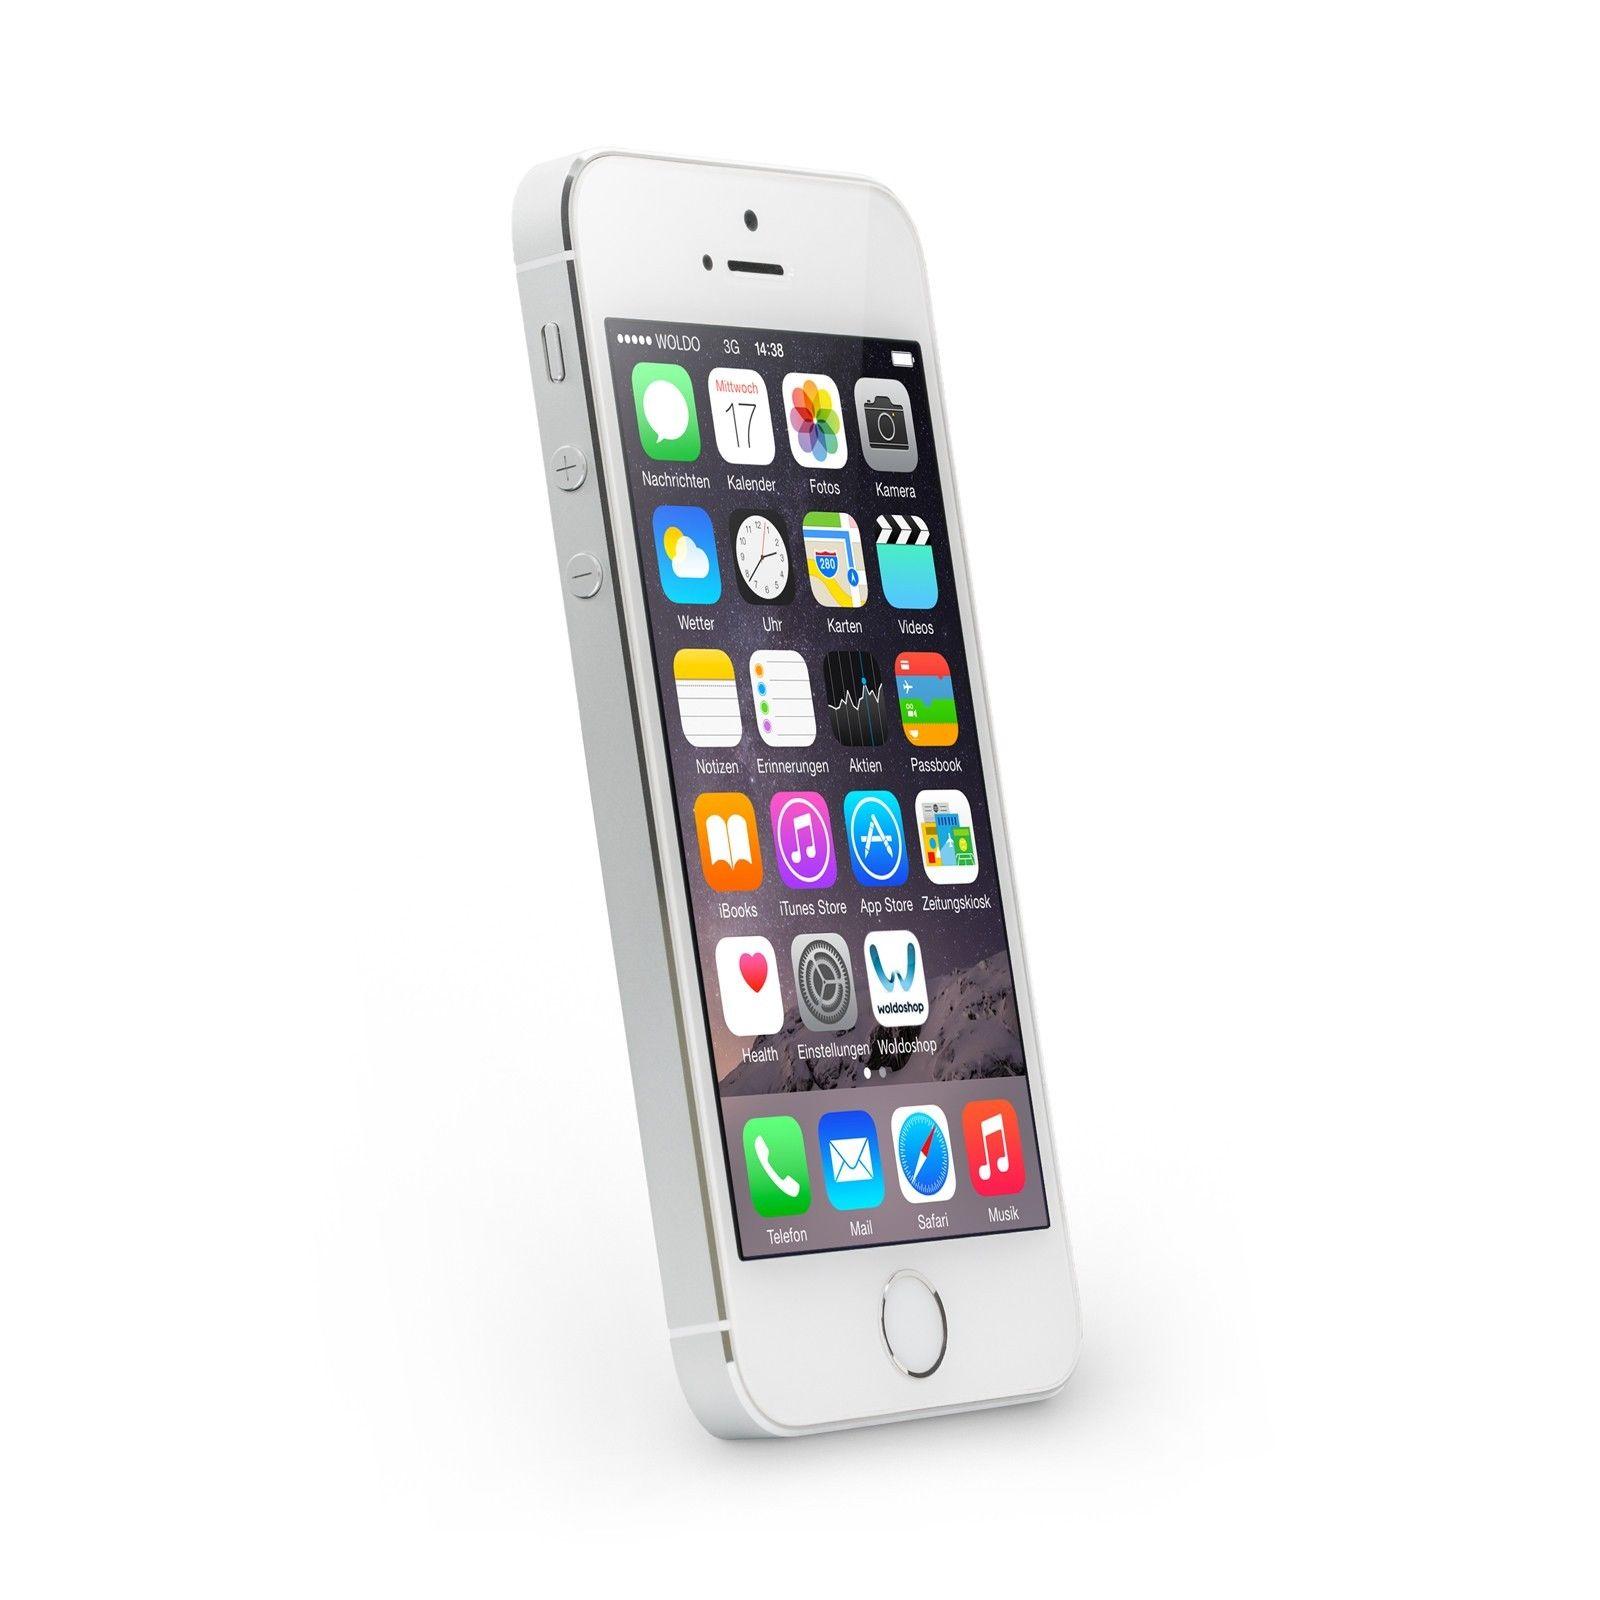 Apple iPhone 5s 16GB Silber Ohne Simlock Ohne Vertrag Smartphone